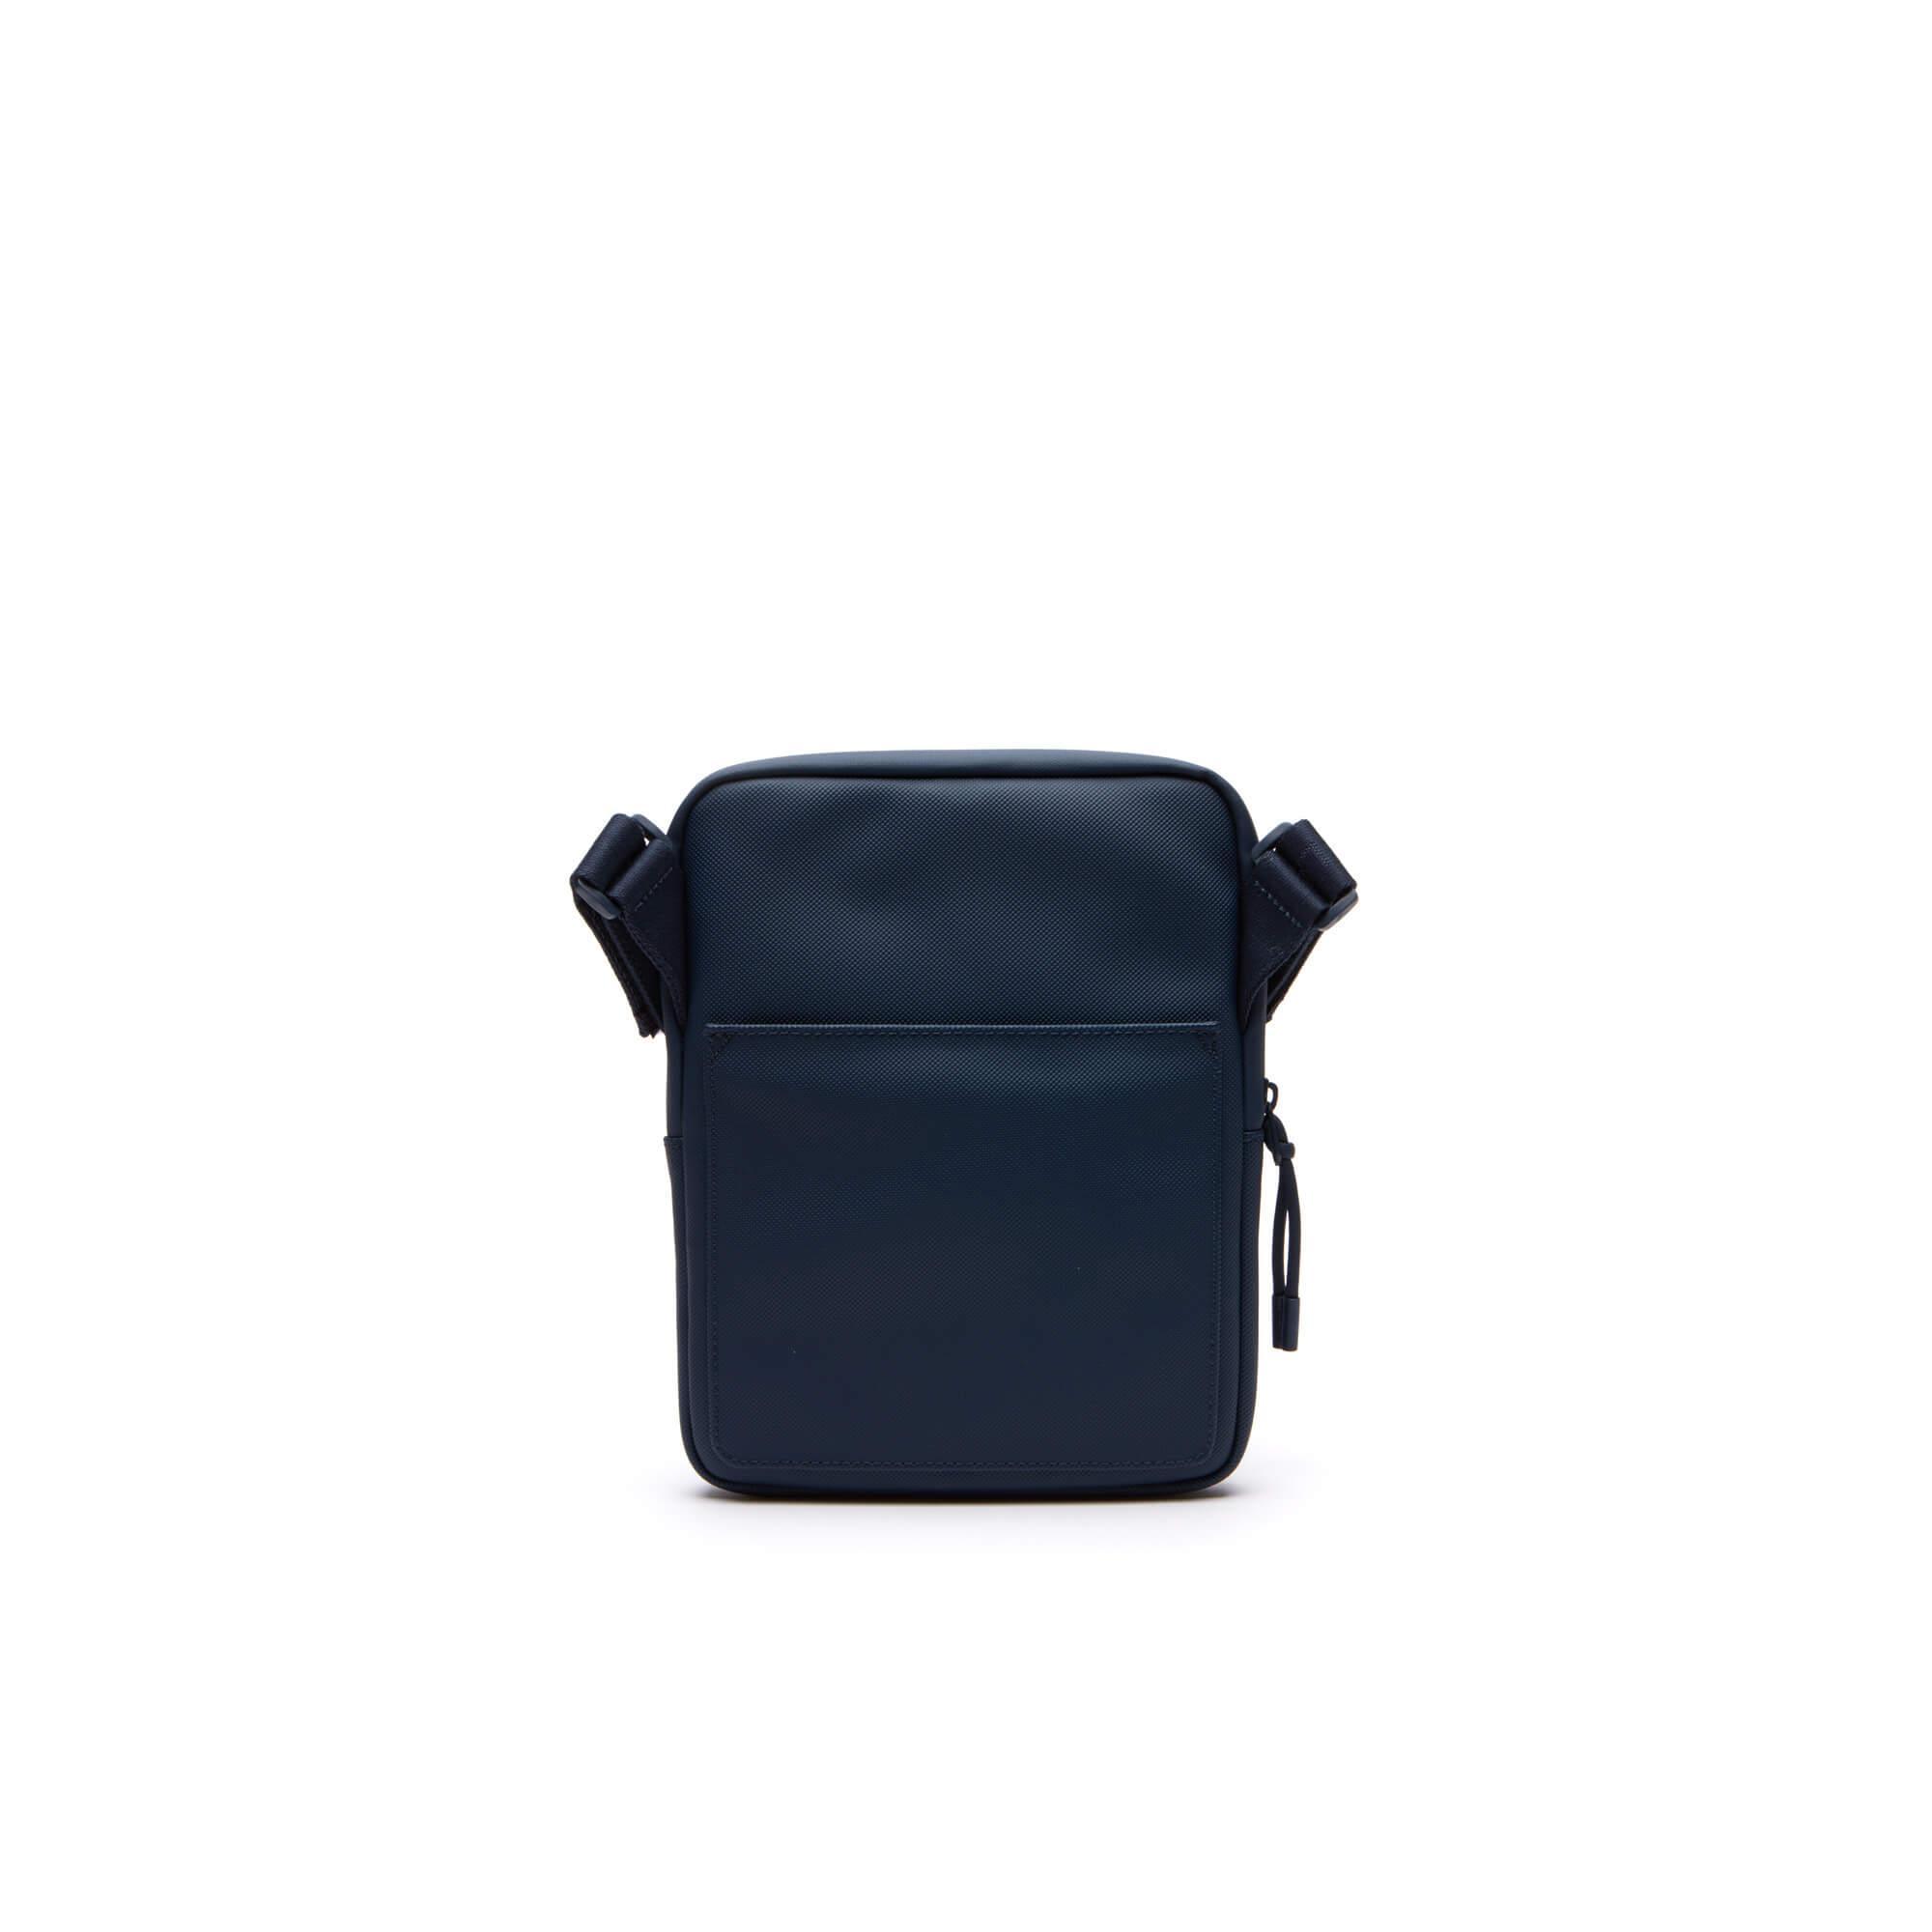 Lacoste Erkek L.12.12 Concept Mavi Kamera Çantası